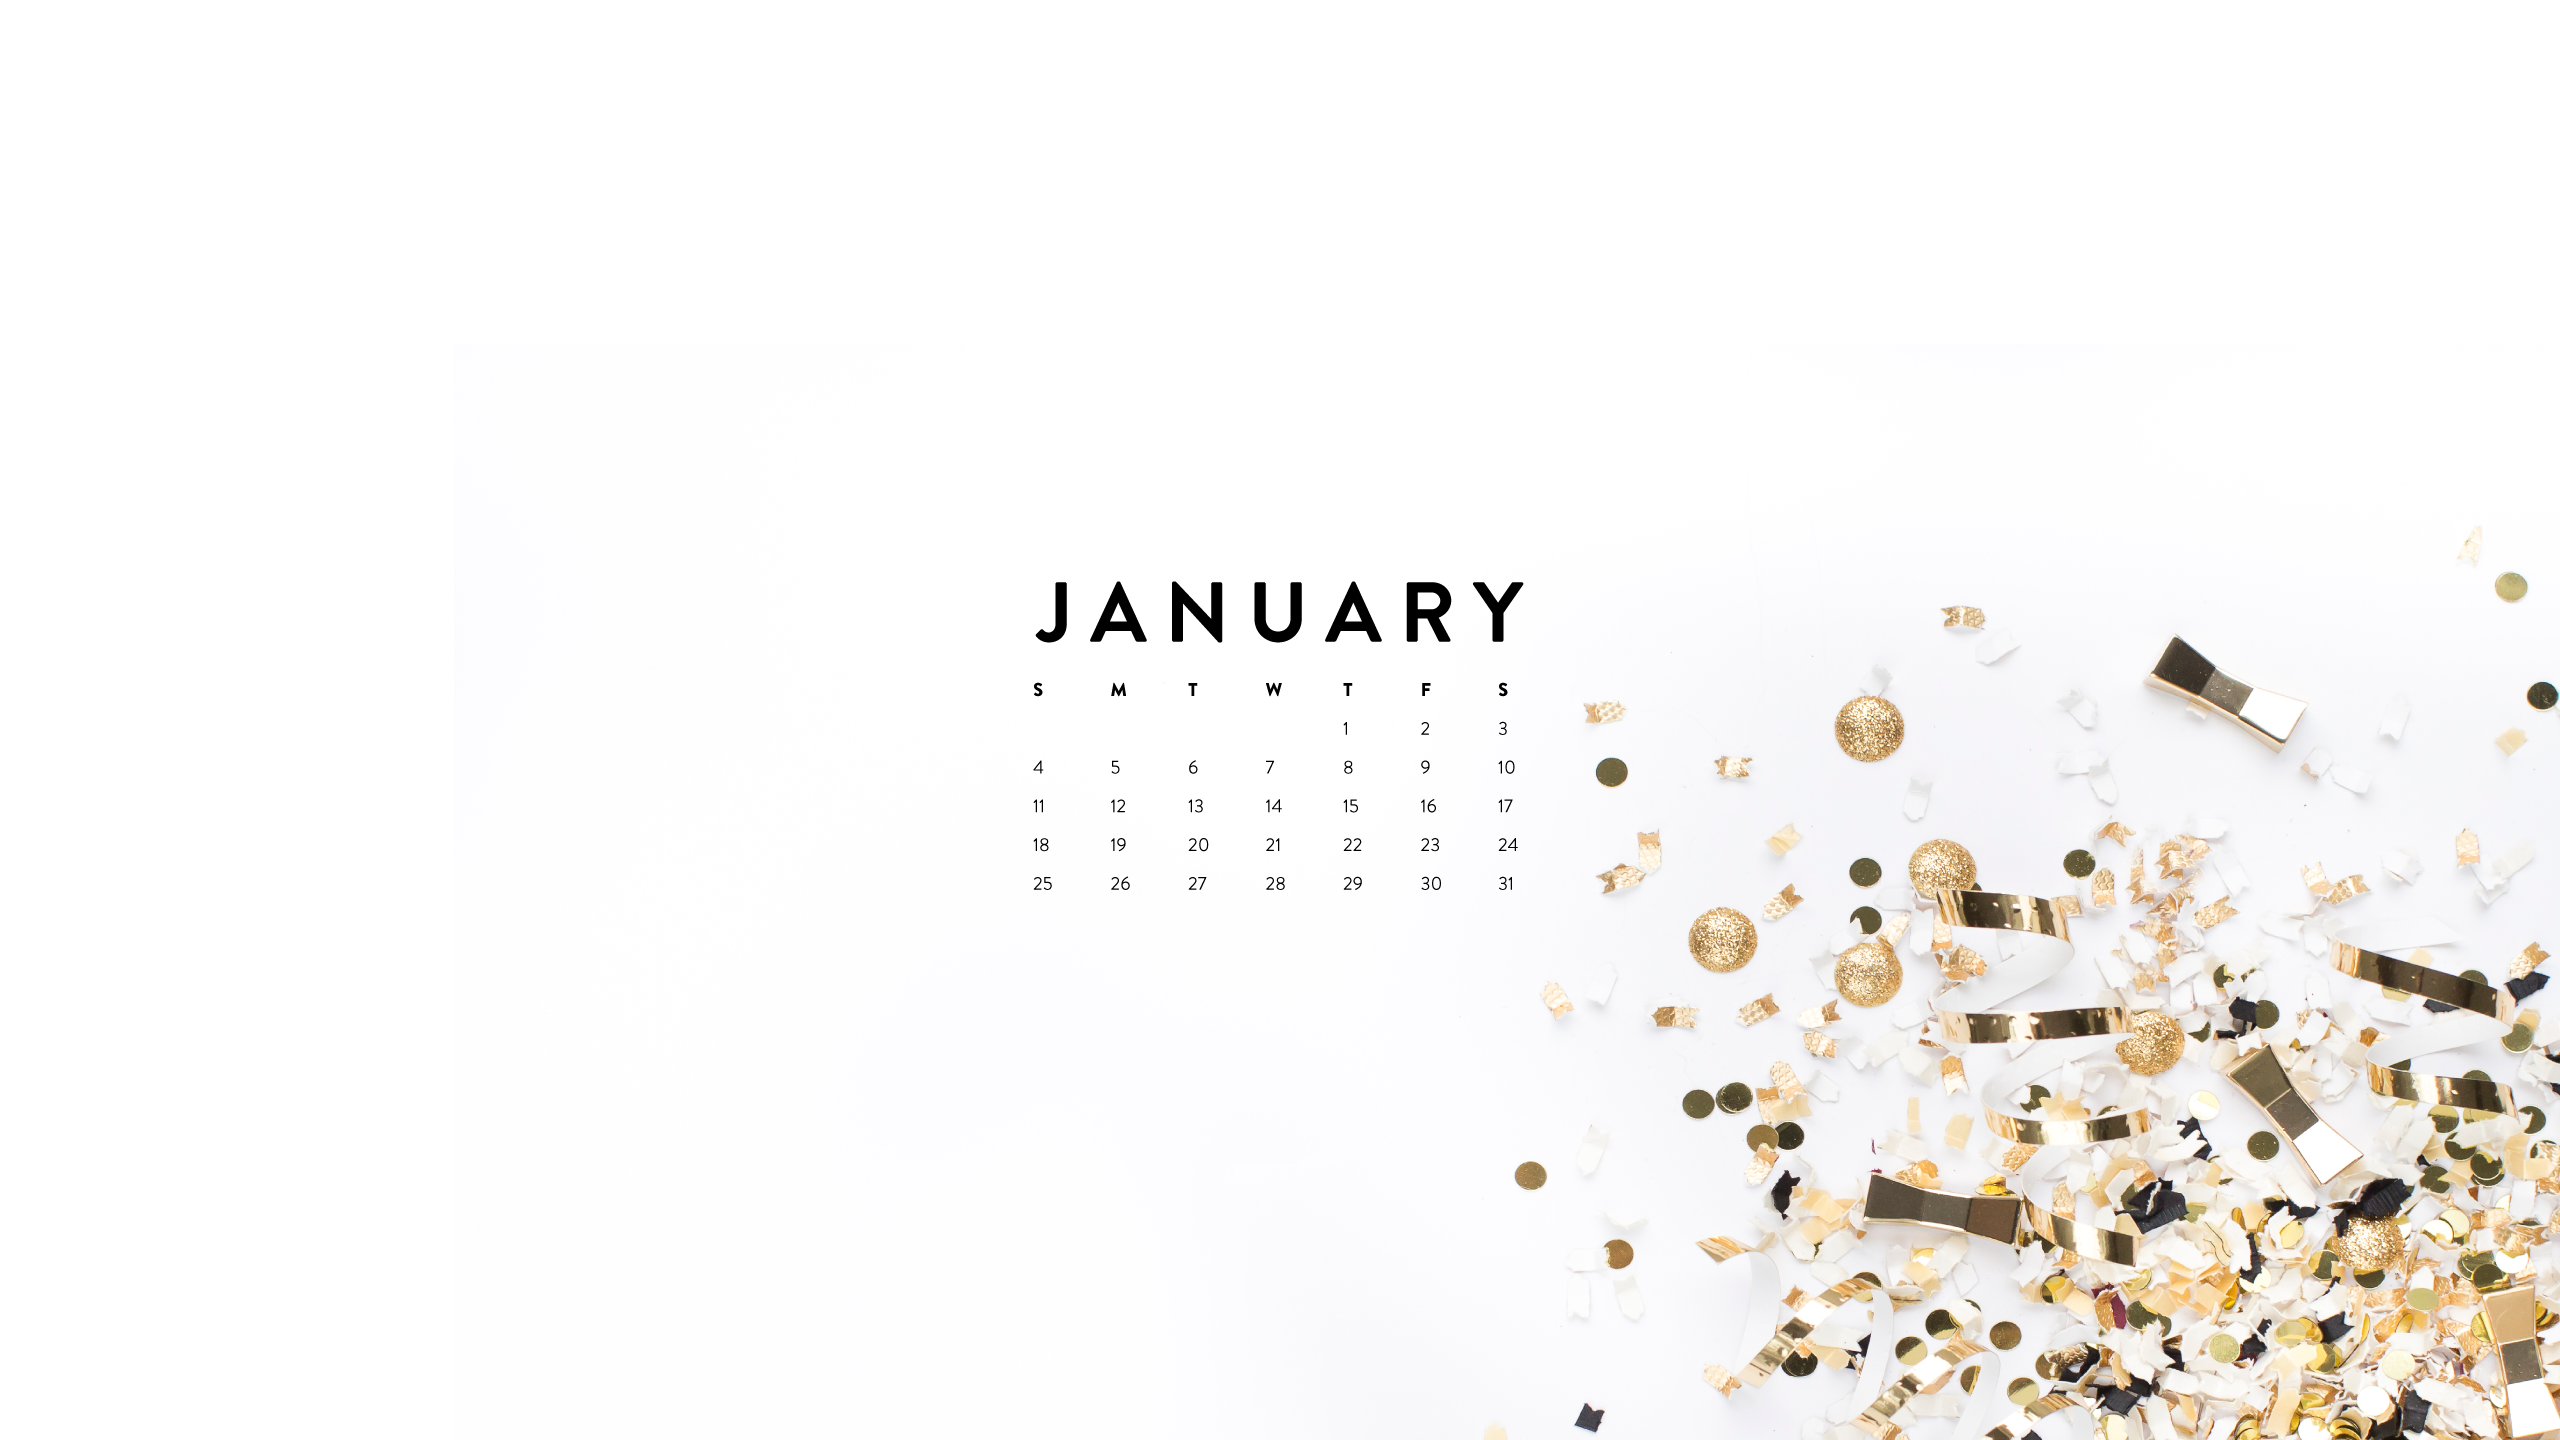 January 2015 Desktop wallpaper   1410583 2560x1440